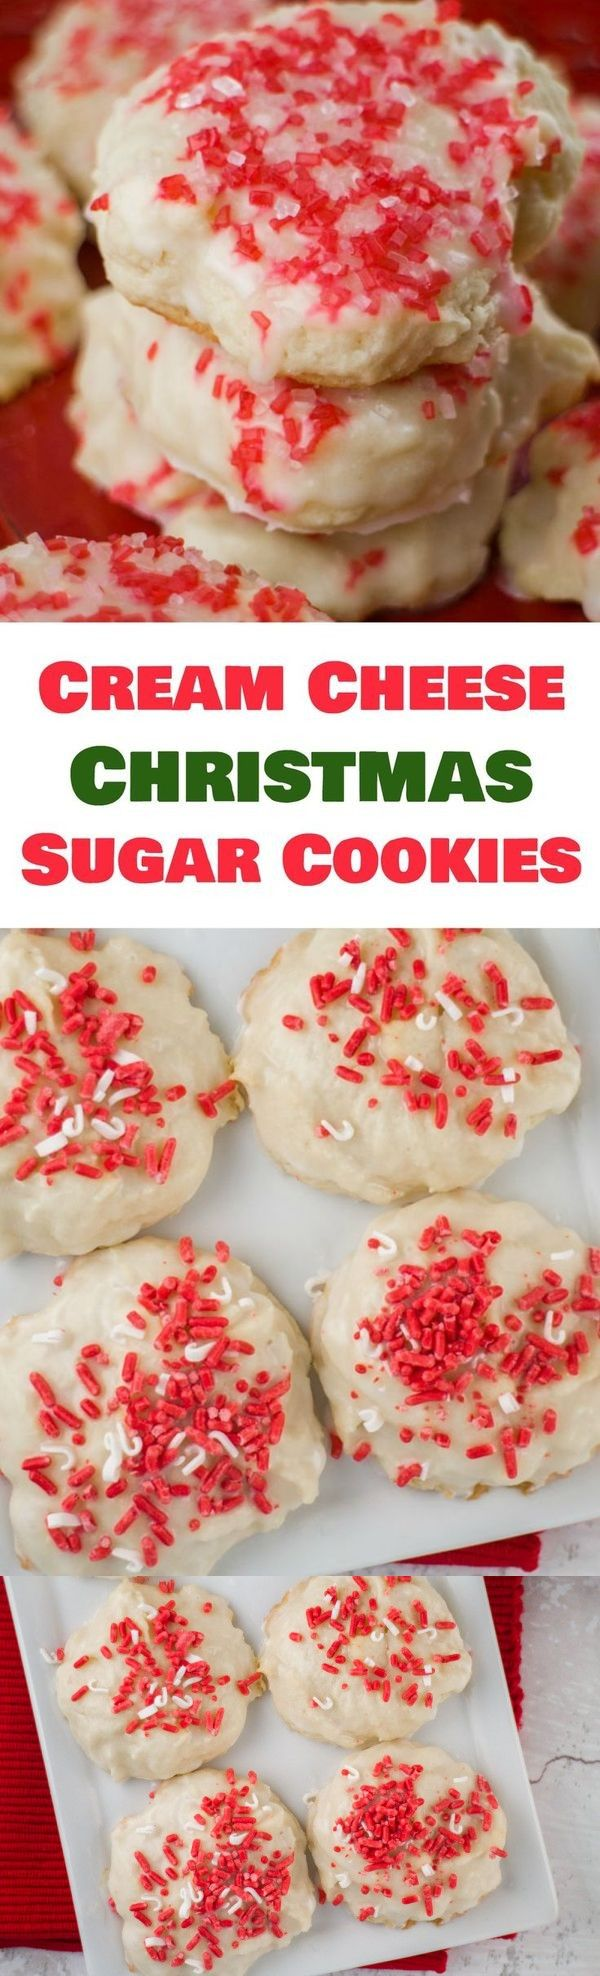 Christmas Cream Cheese Sugar Cookies